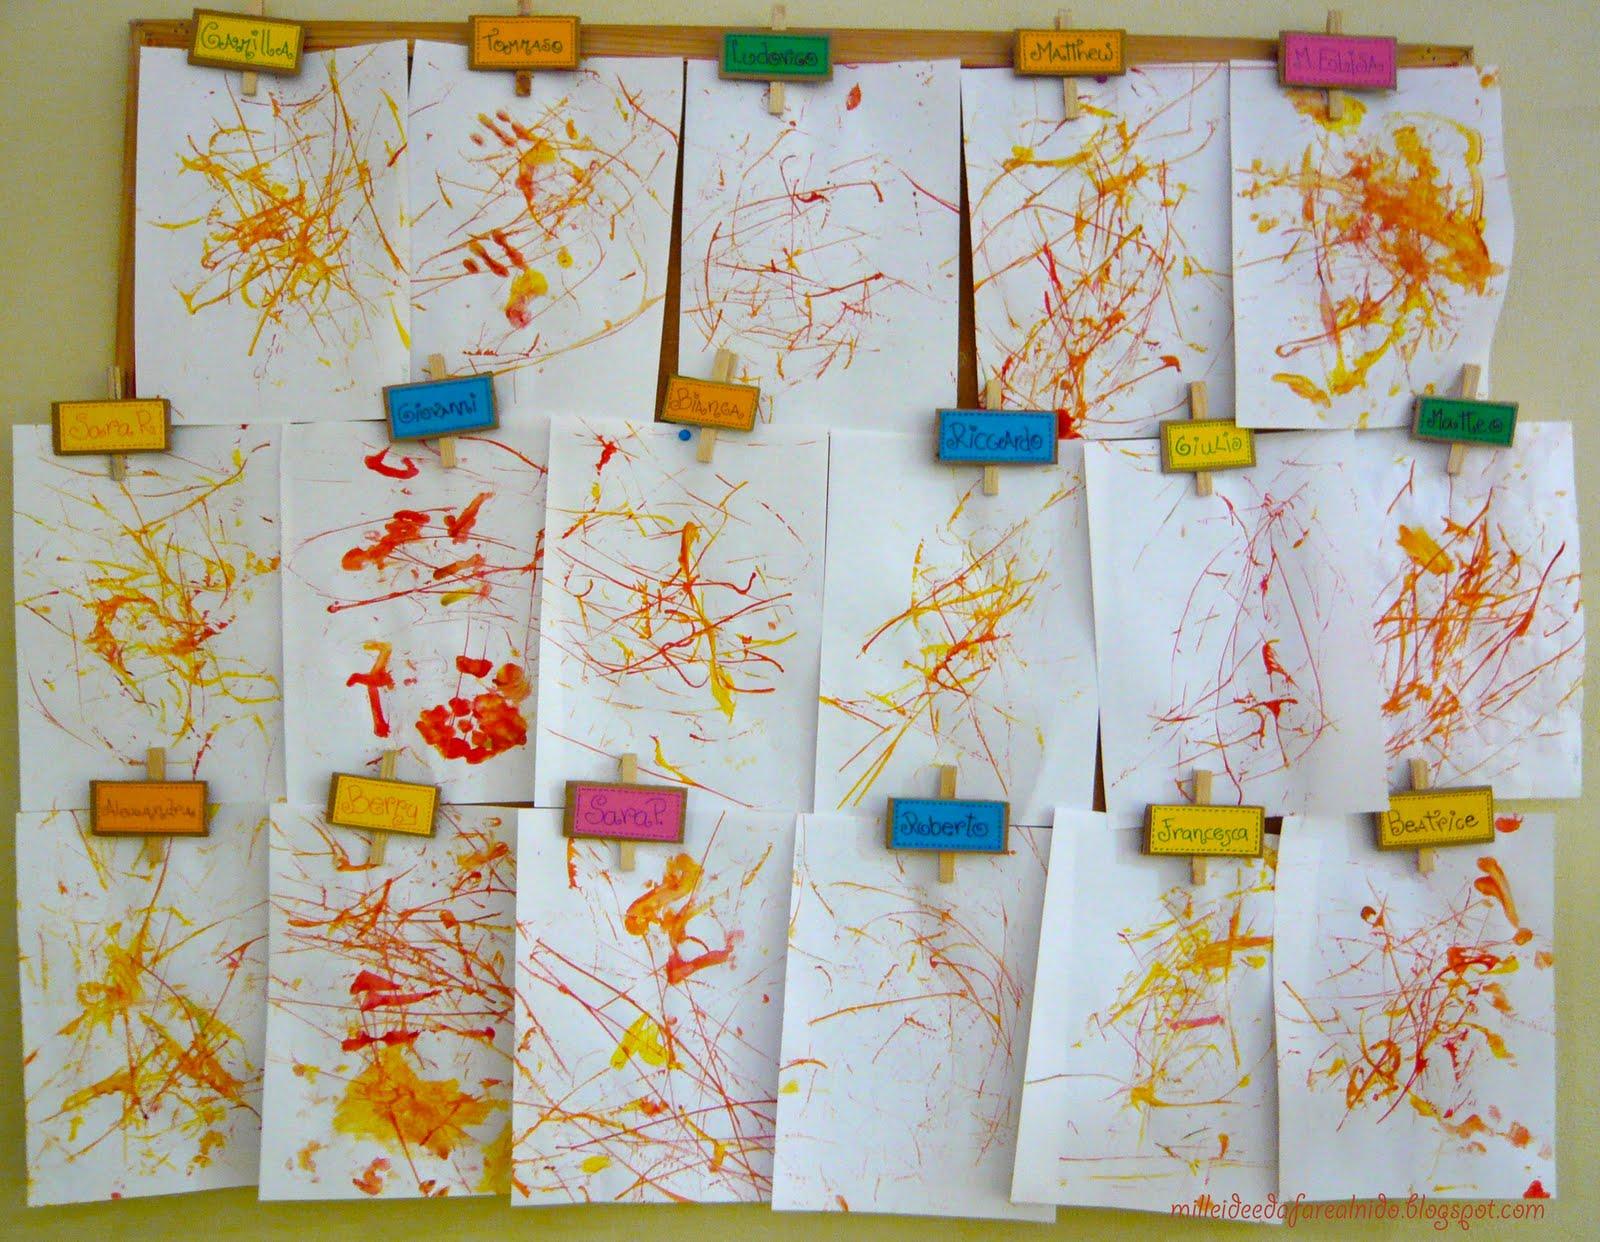 Estremamente Mille idee al nido: Fili di lana KY39